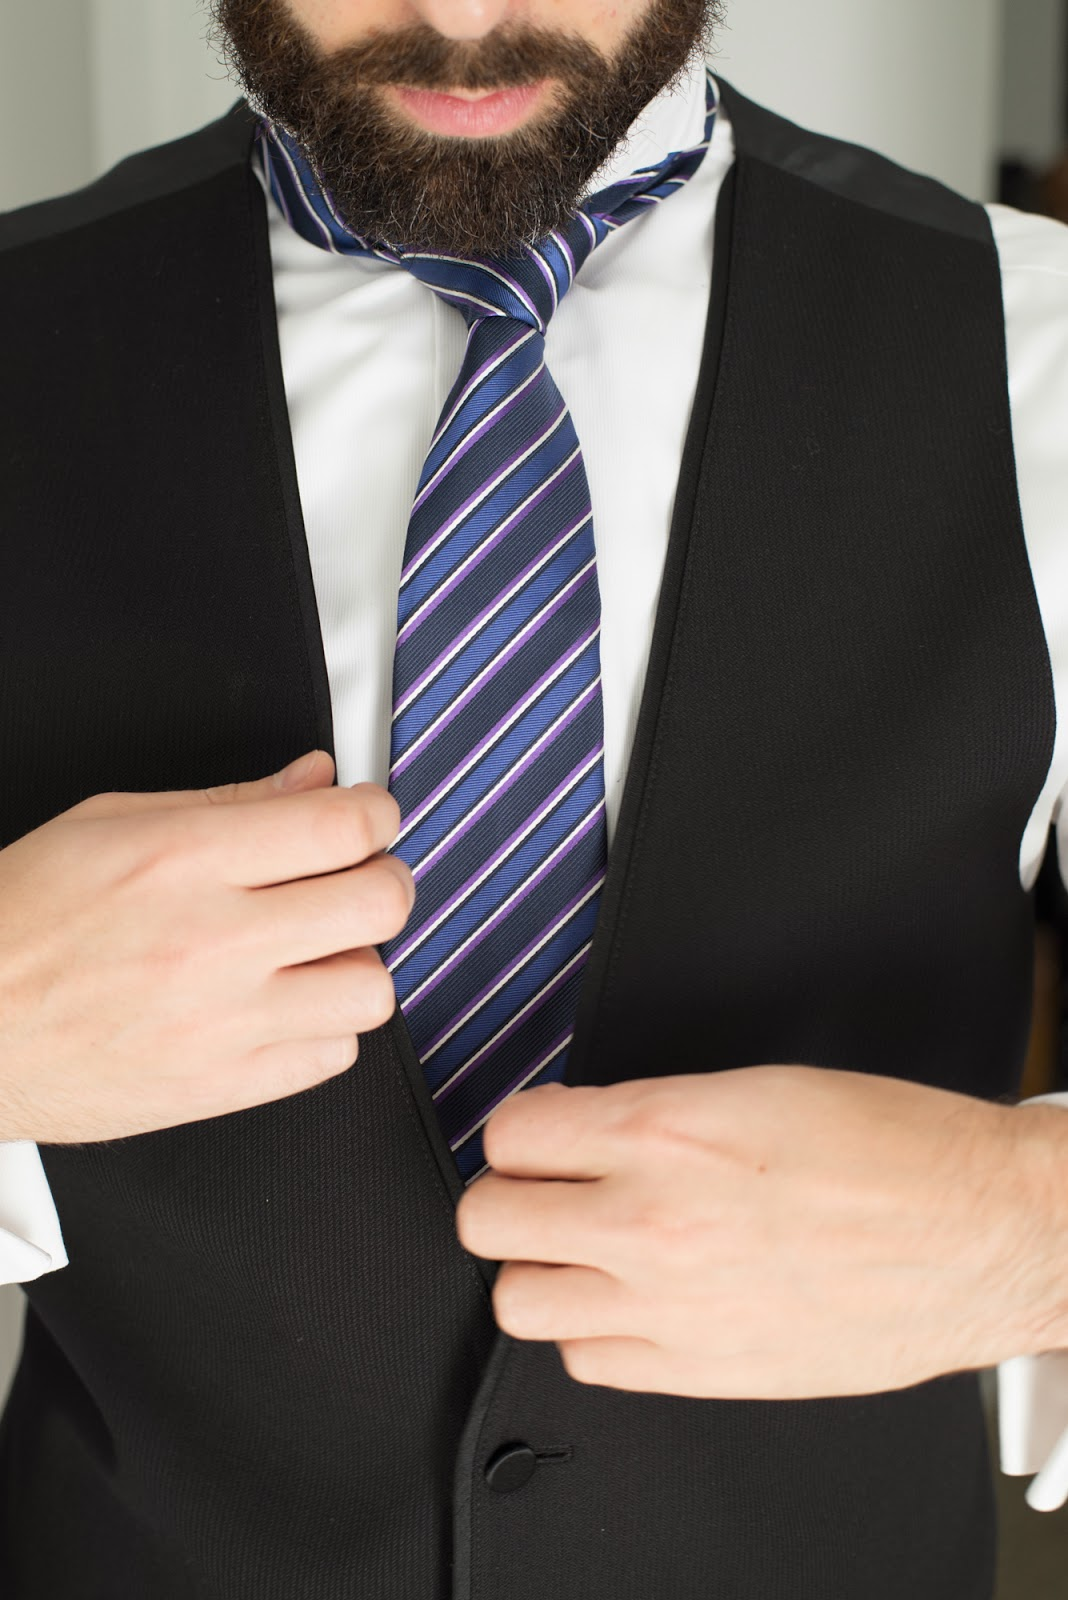 Men's wedding tie - cultivatedrambler.com